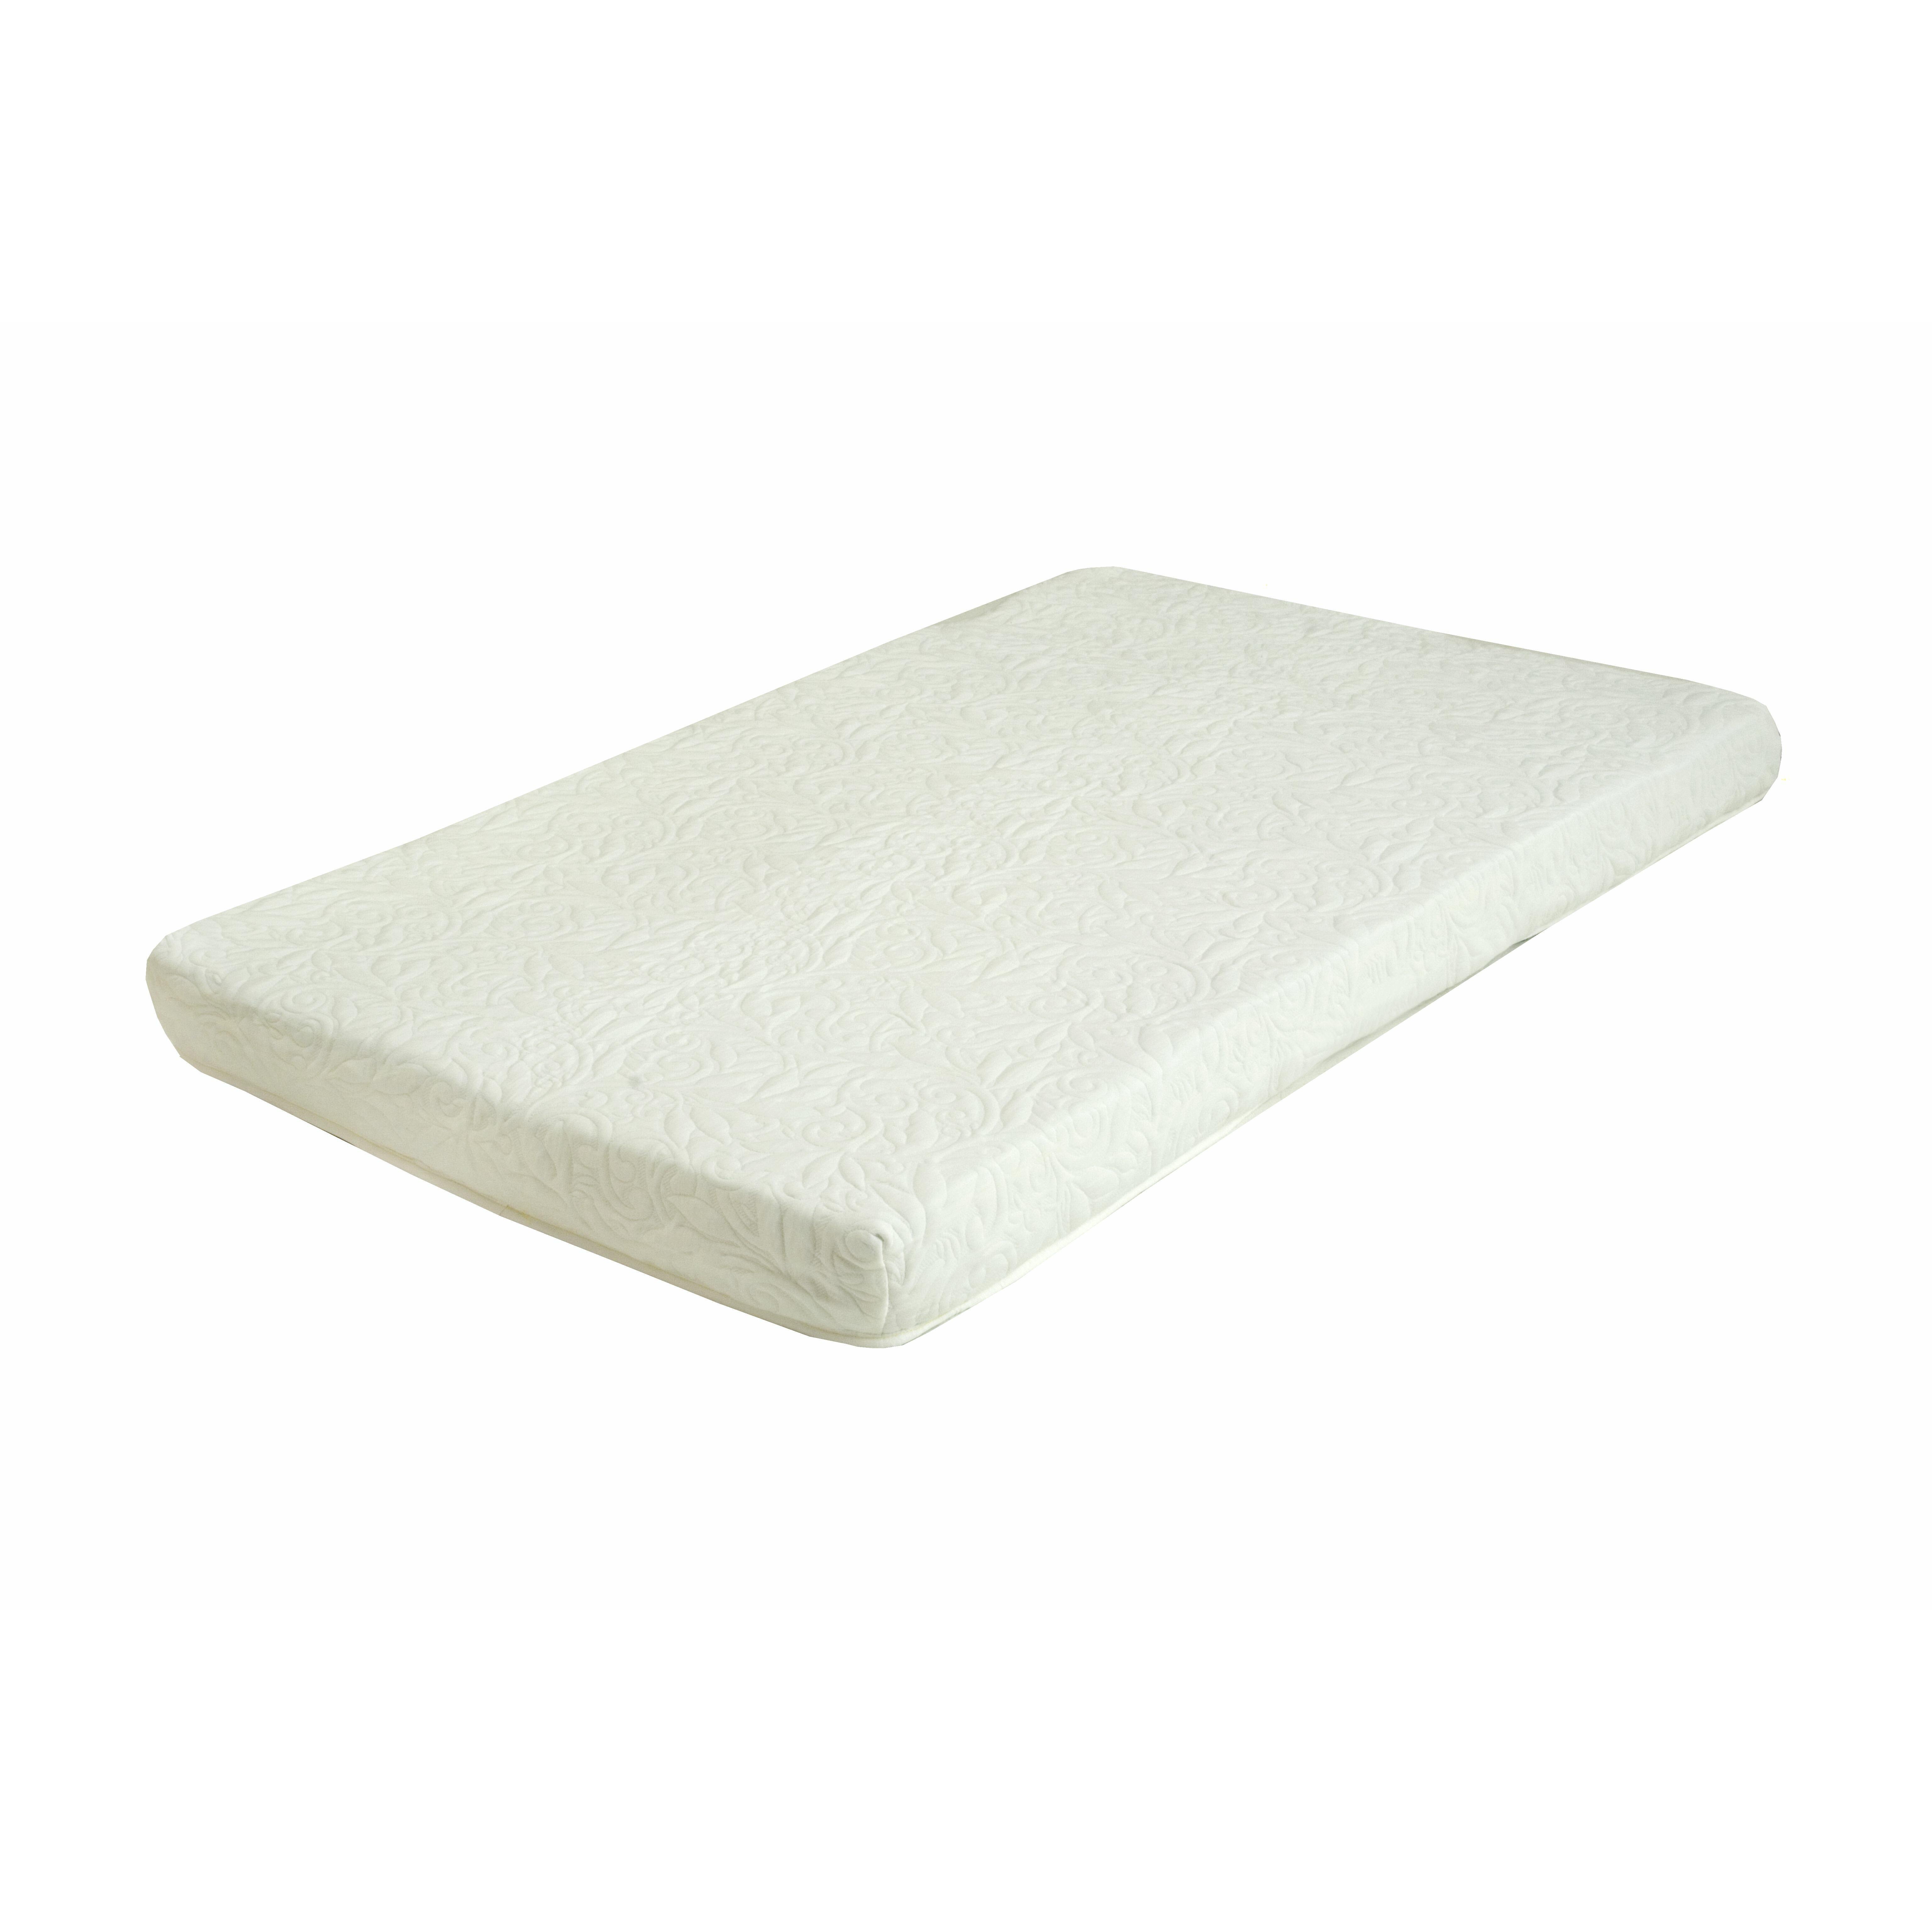 Innerspace Luxury Products Luxury 4 5 Rv Memory Foam Mattress Wayfair